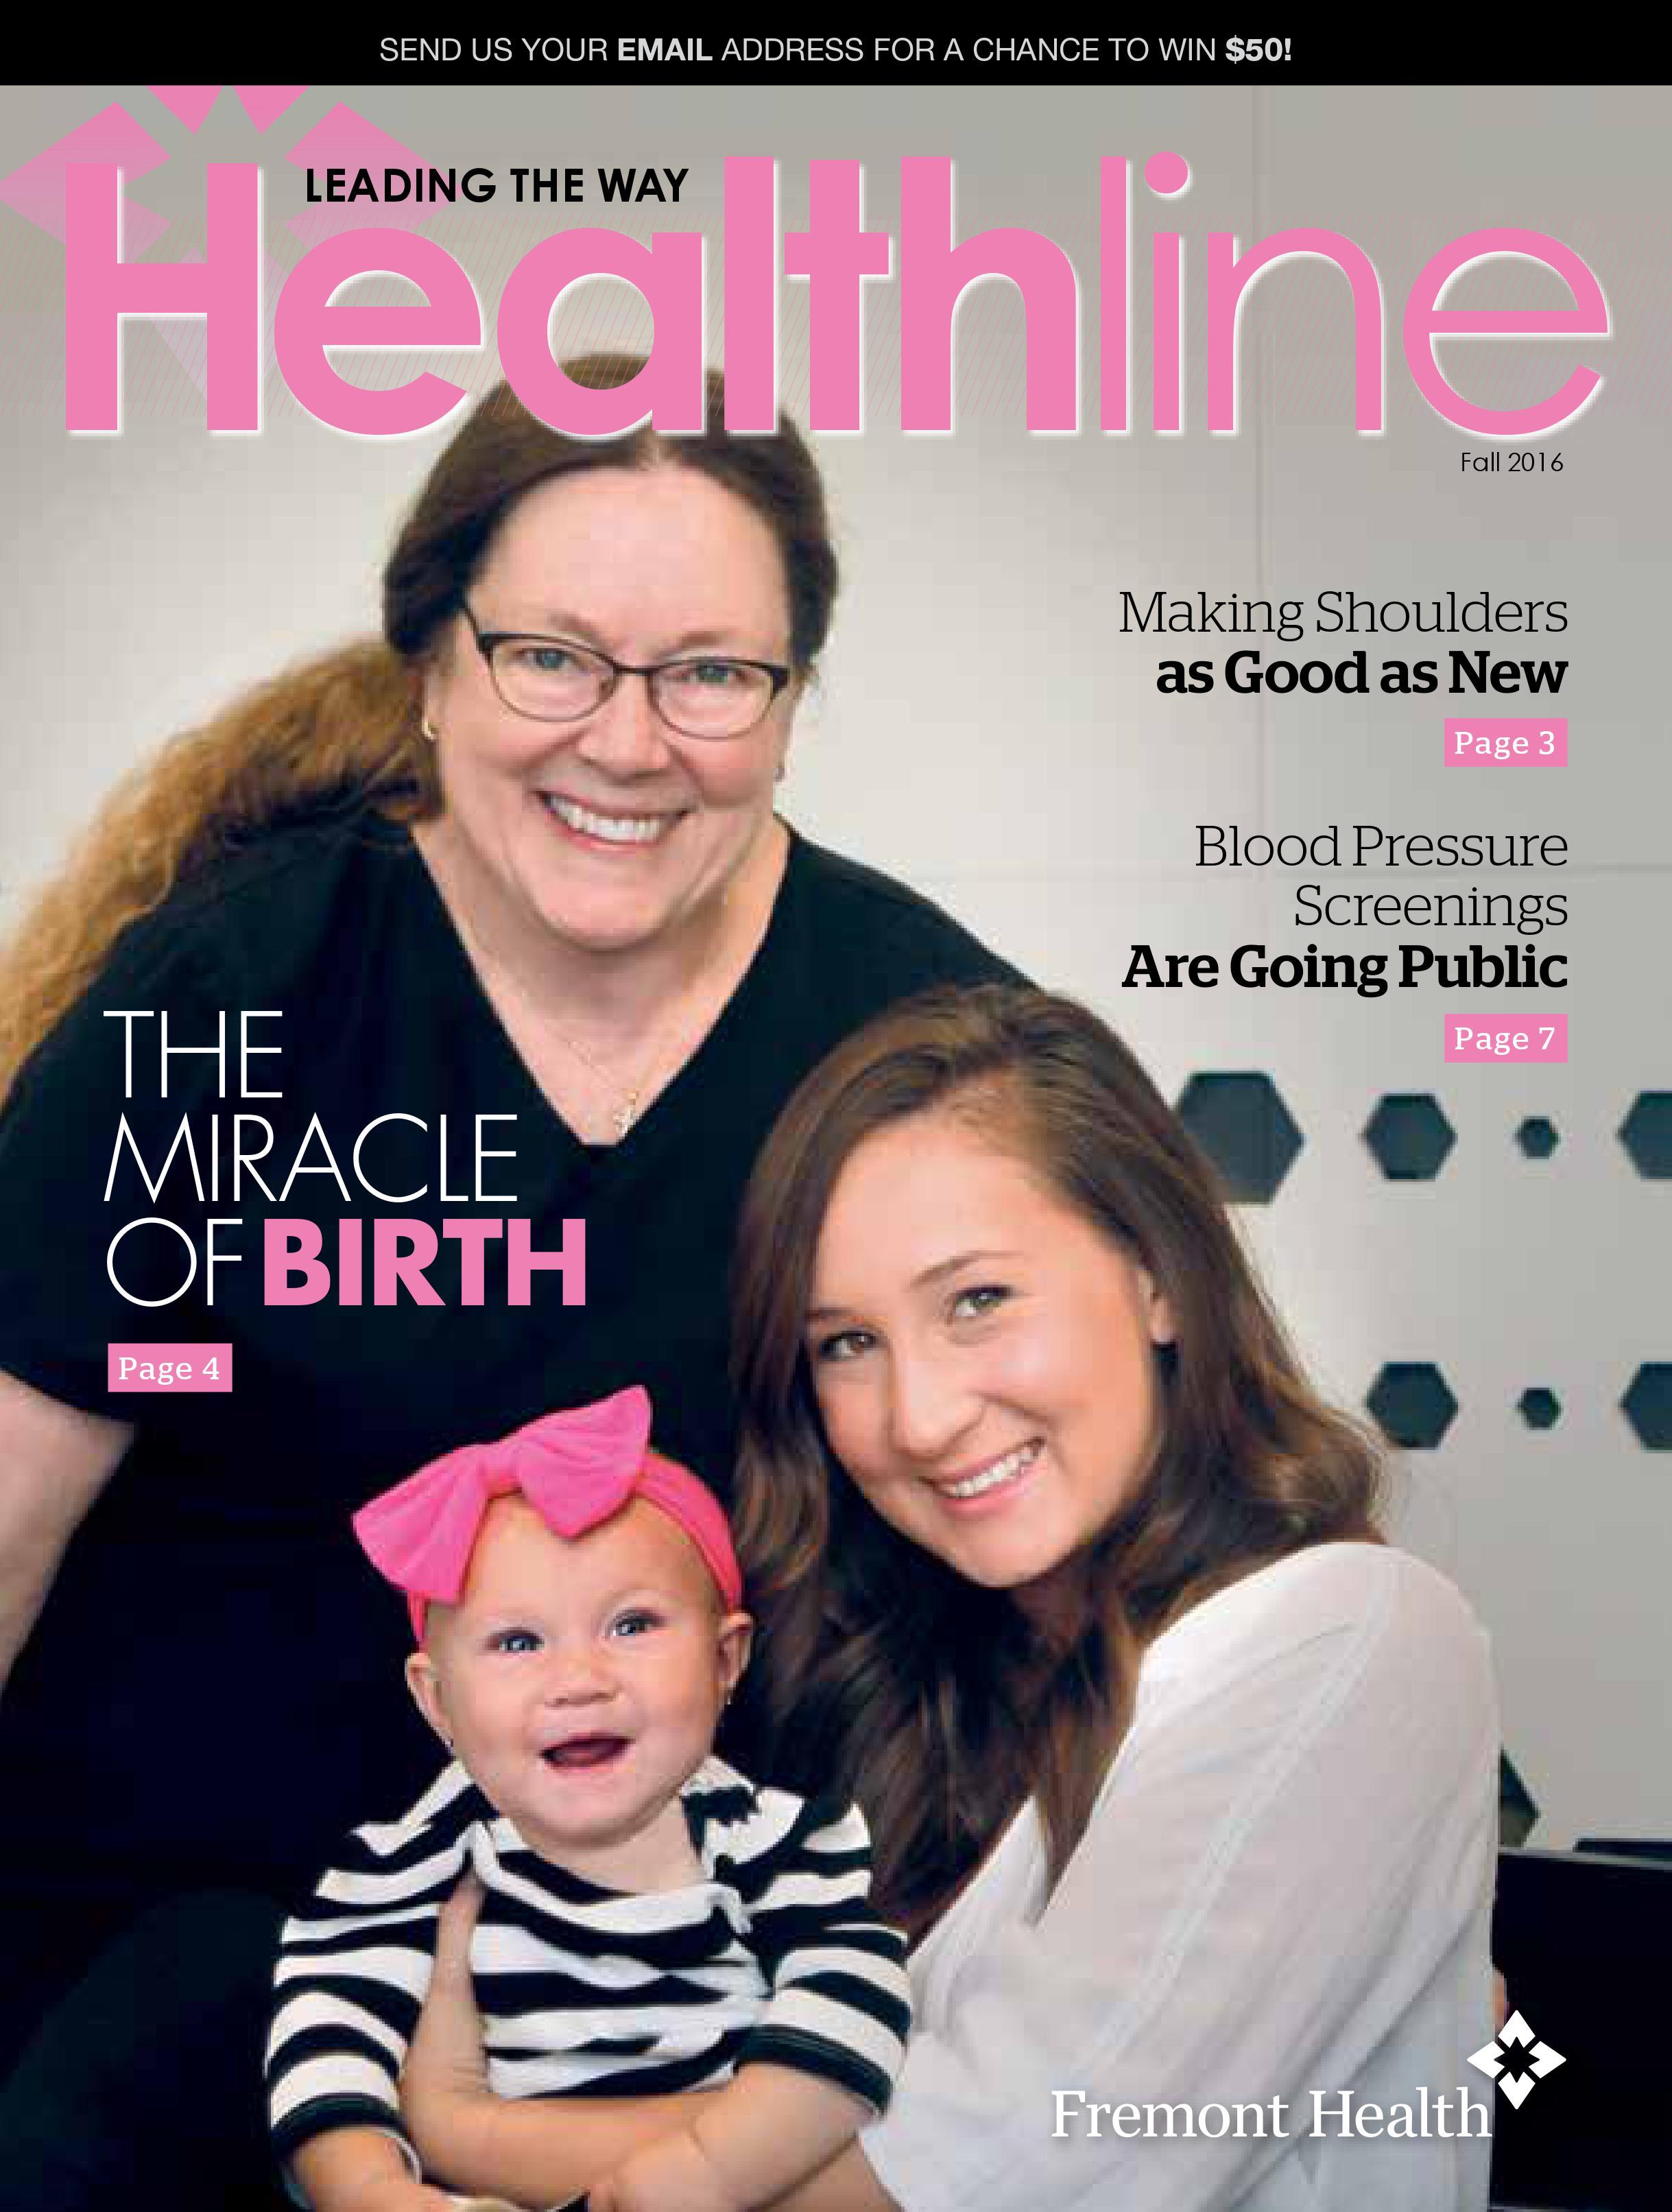 Healthline Fall 2016